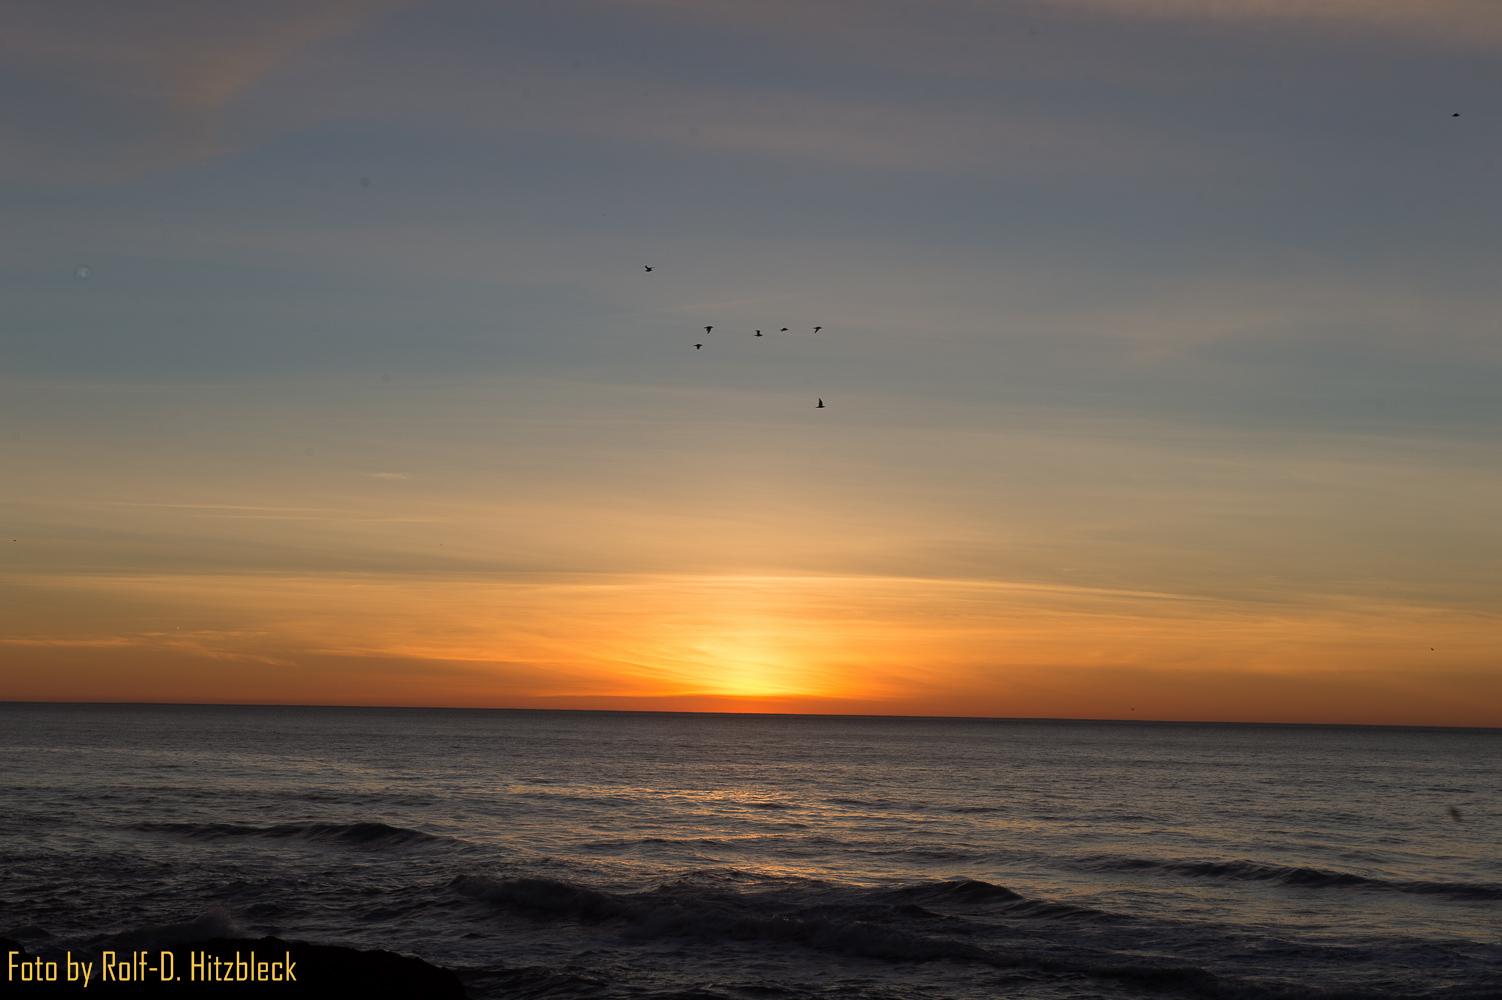 16.02.2015 – Gleneden Beach, Newport, Thor's Well